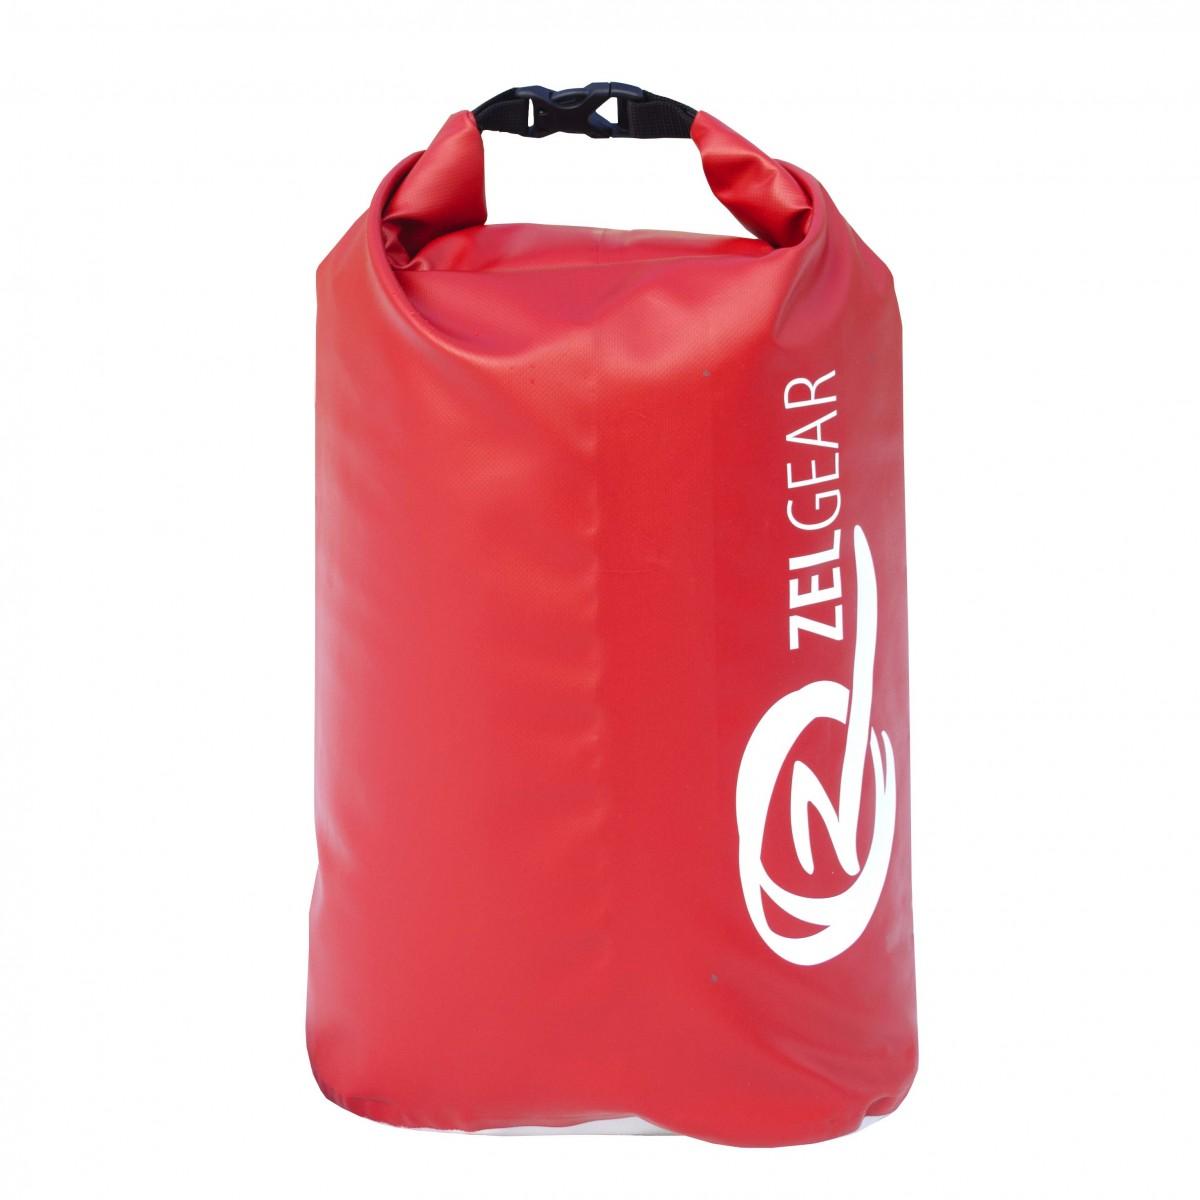 ZelGear Dry Bag, PVC, 15 L image